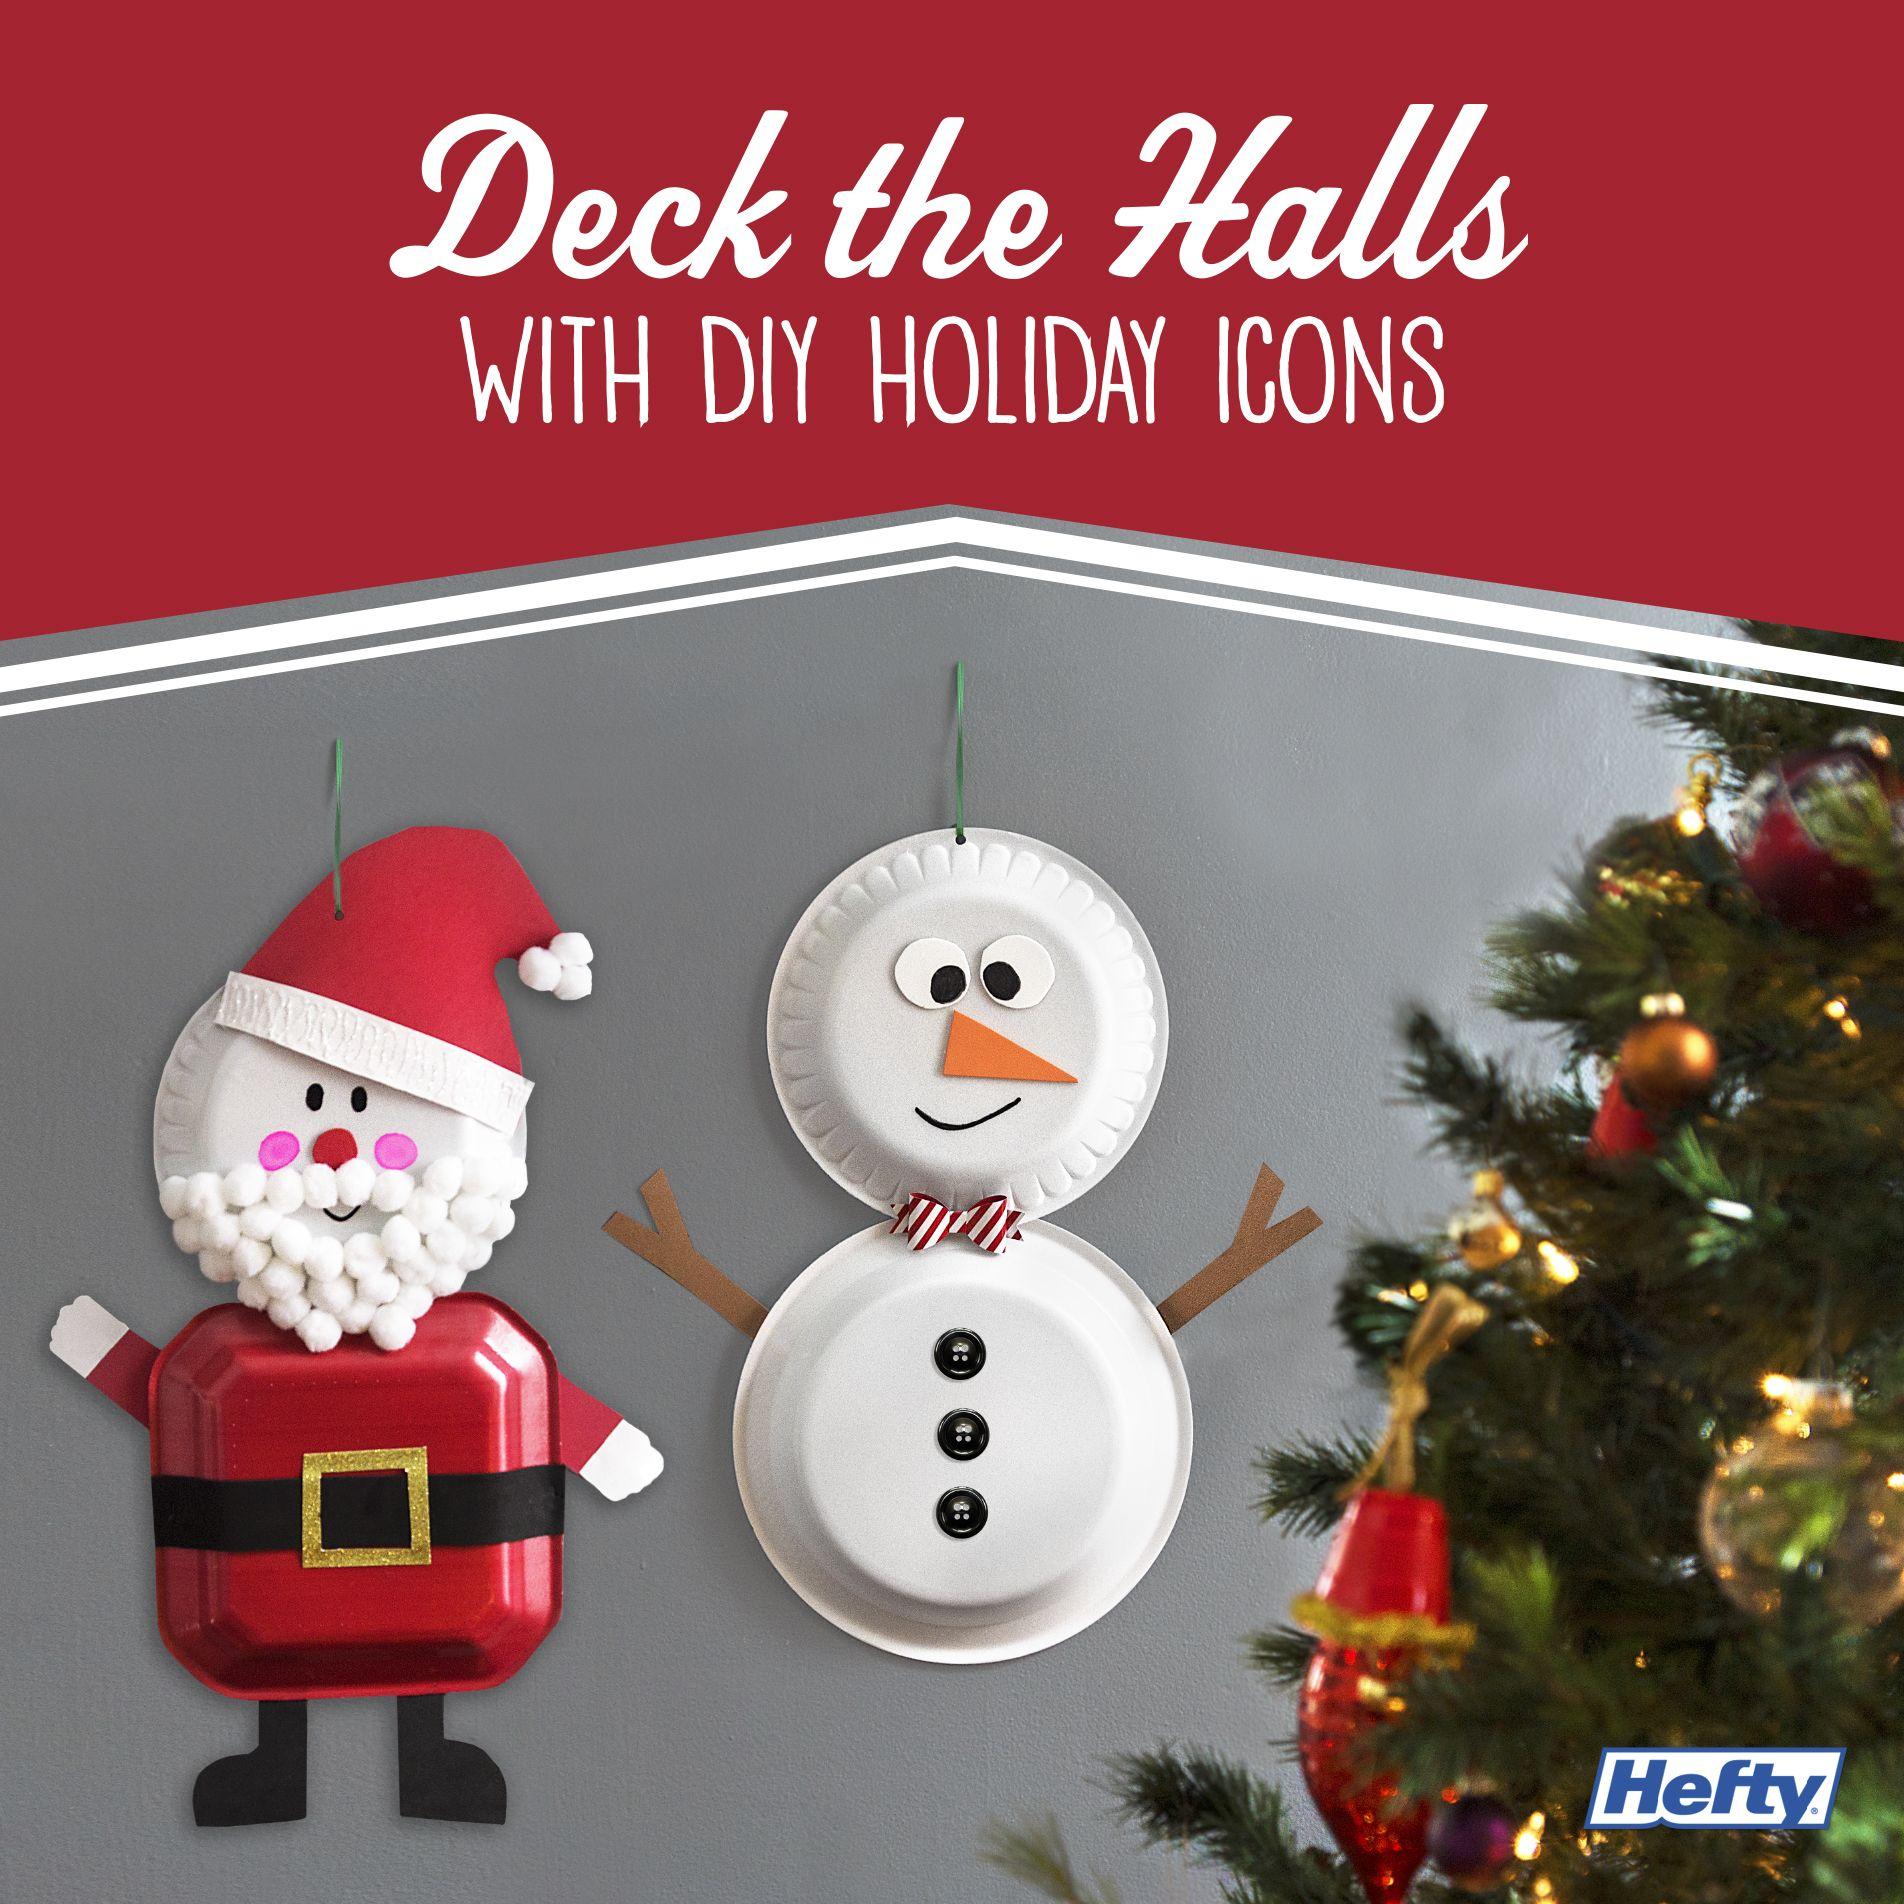 Make a DIY snowman or Santa decoration with Hefty Foam Plates! & Make a DIY snowman or Santa decoration with Hefty Foam Plates! | DYI ...